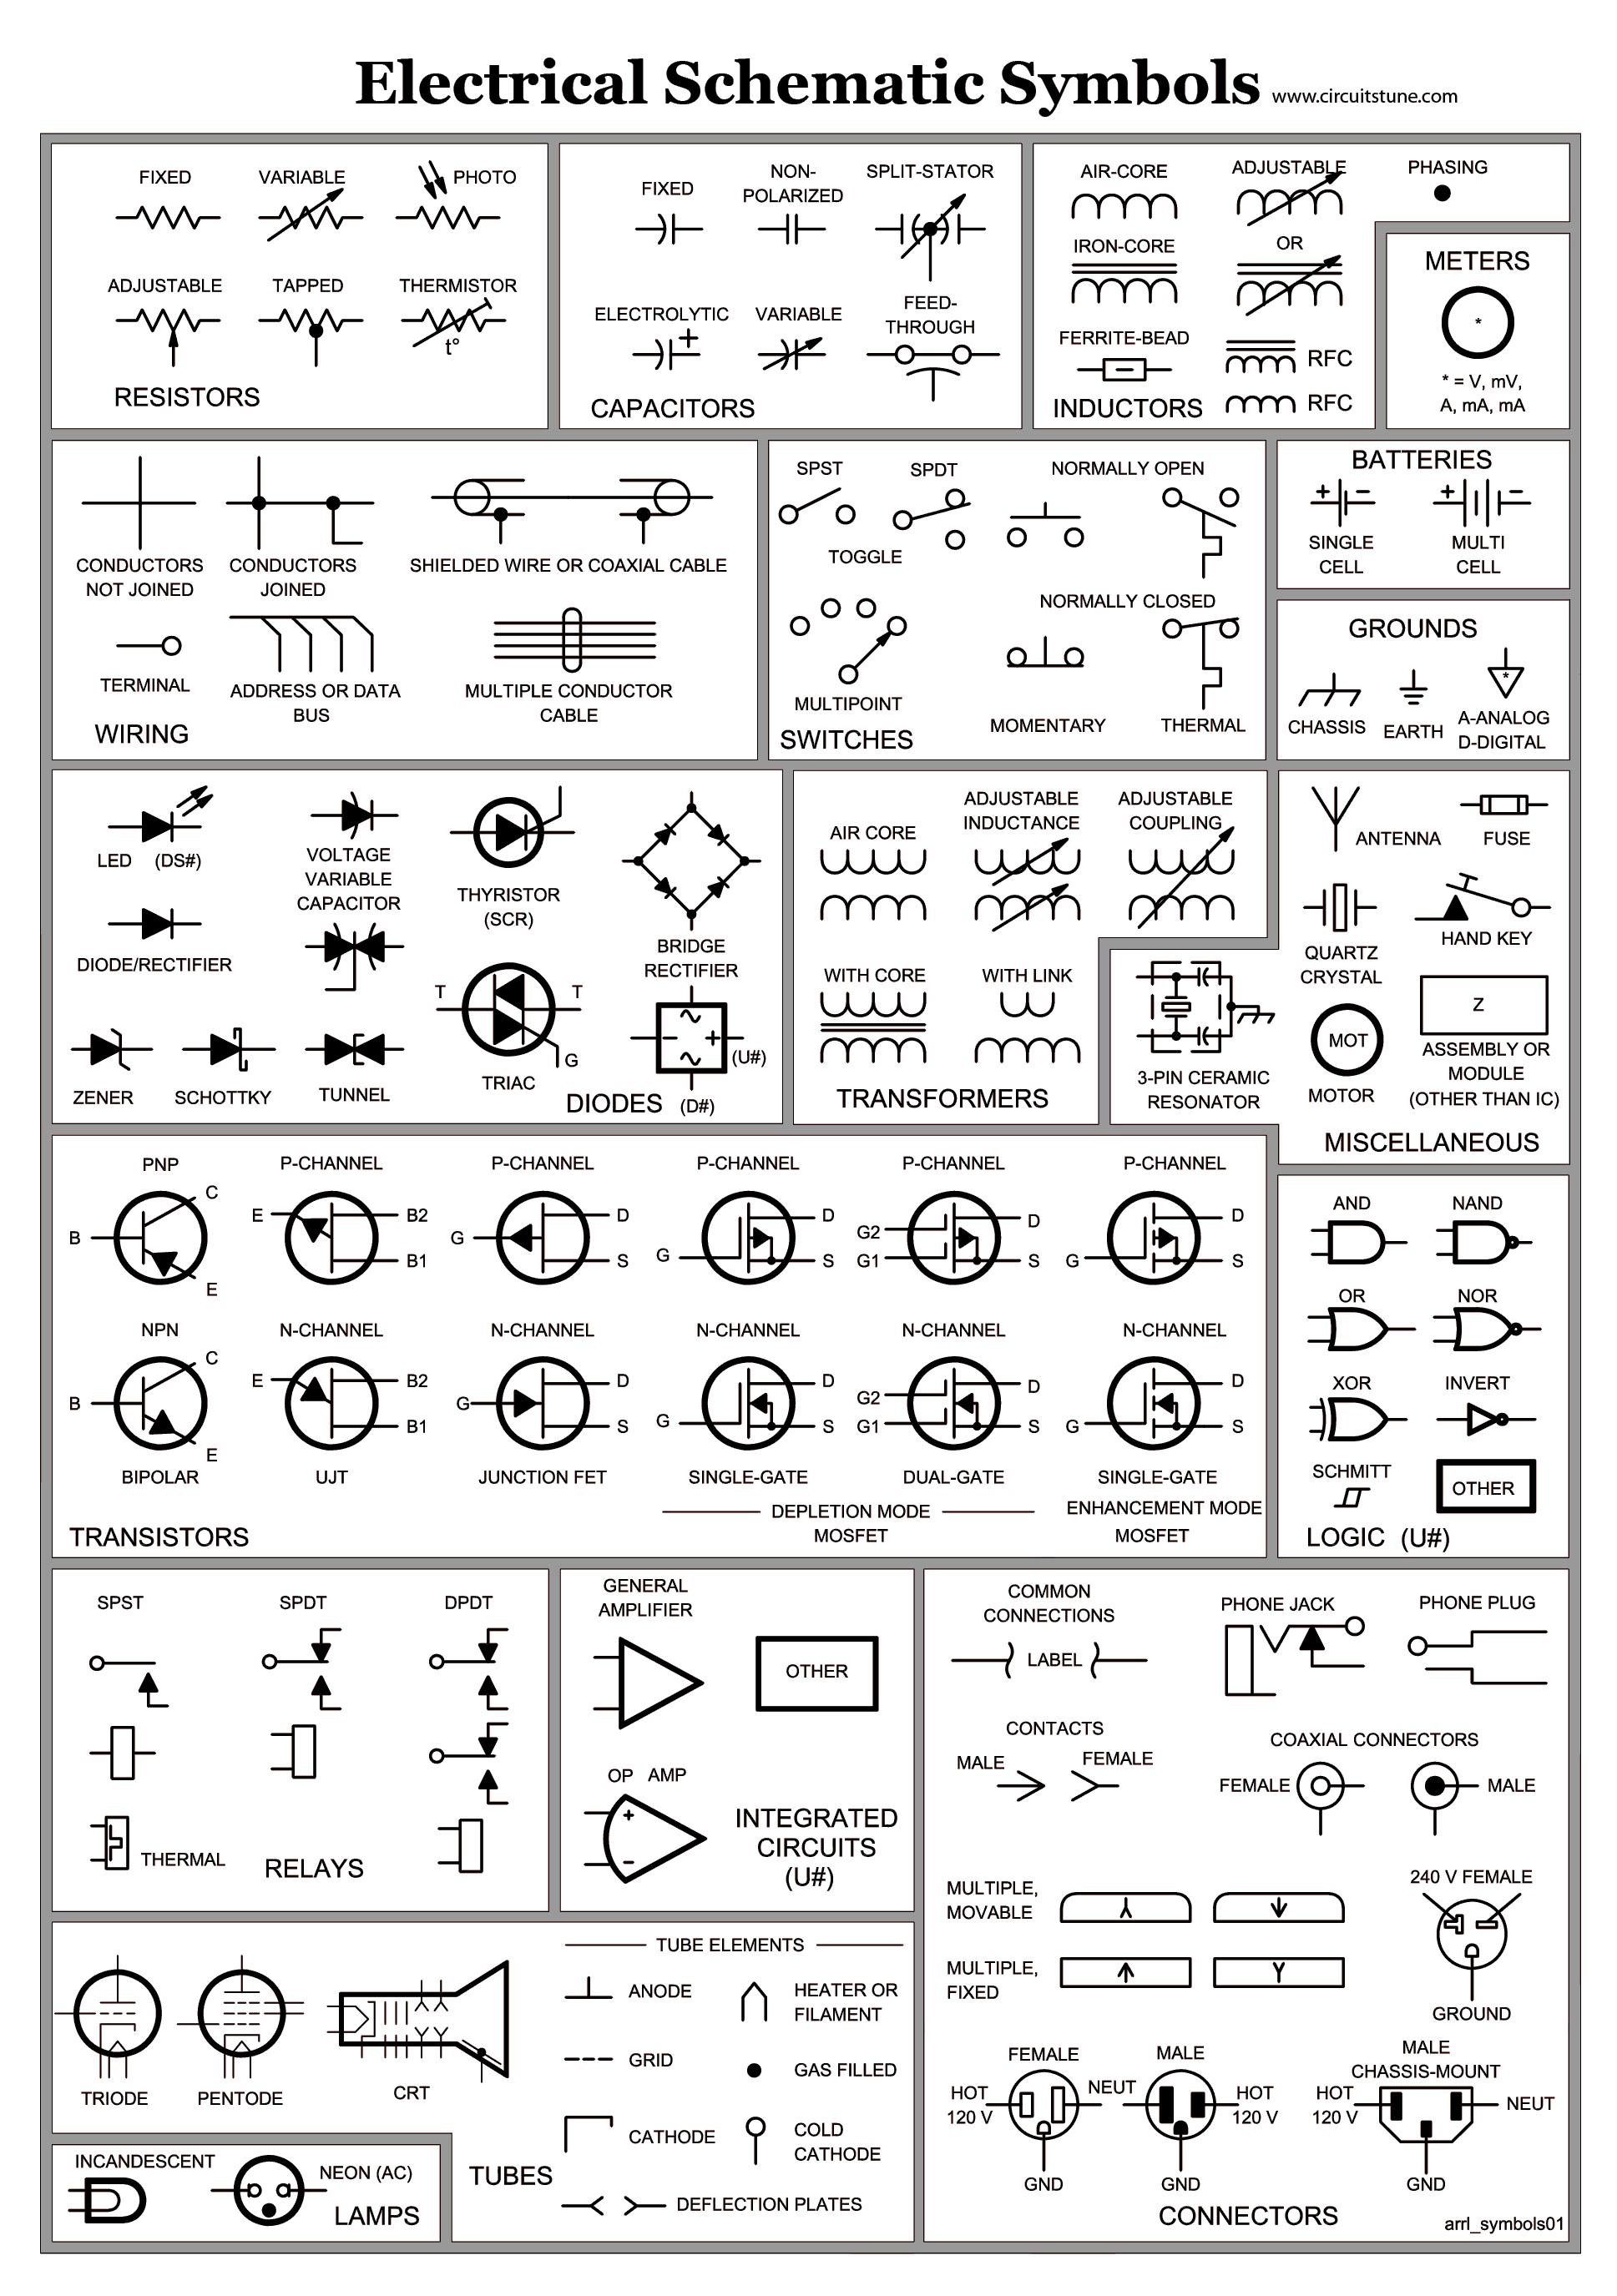 Electrical Schematic Symbols | Electrical Schematic Symbols | Wiring Diagram Symbols